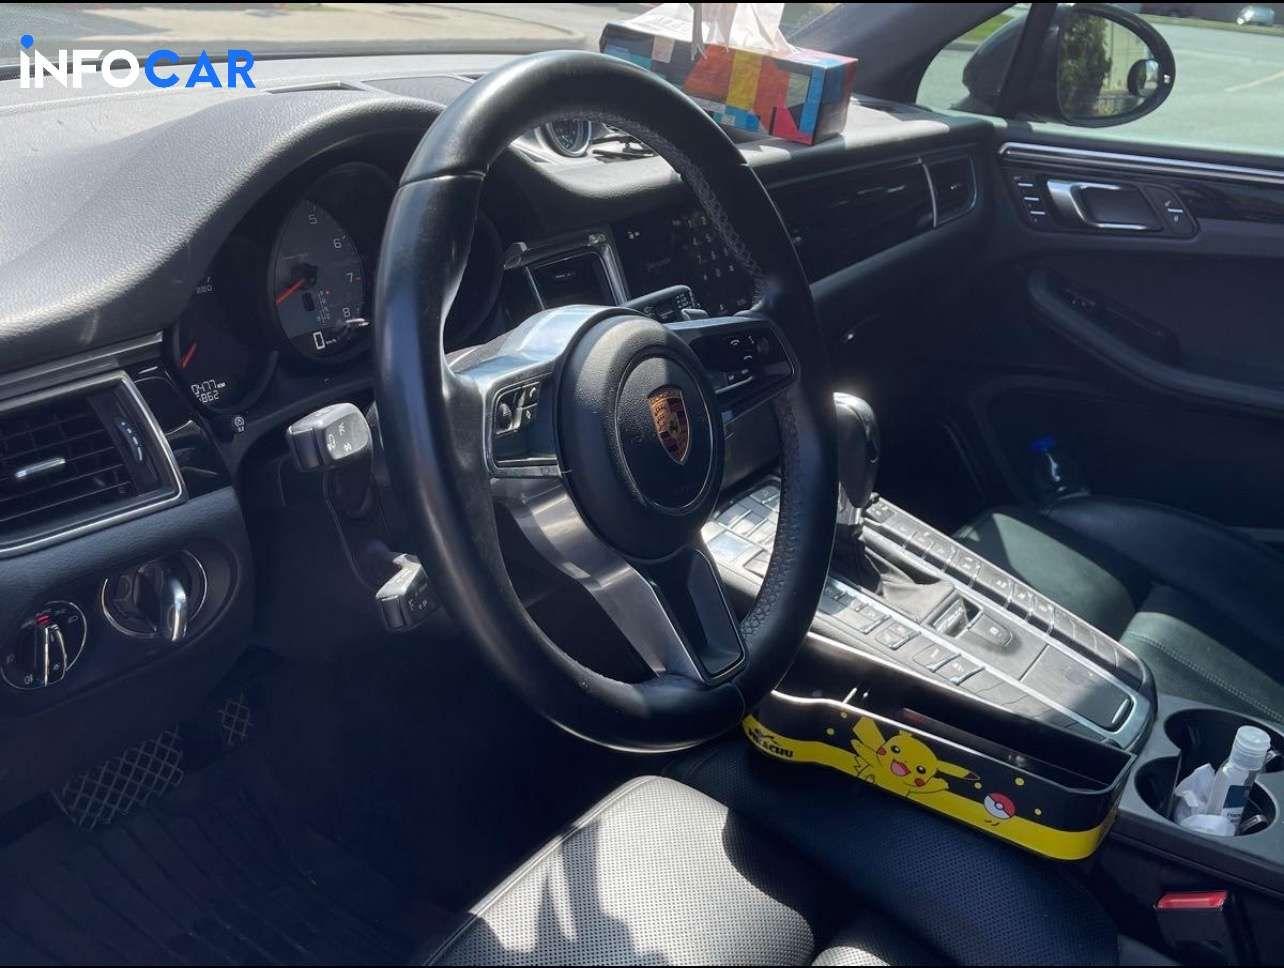 2017 Porsche Macan null - INFOCAR - Toronto Auto Trading Platform